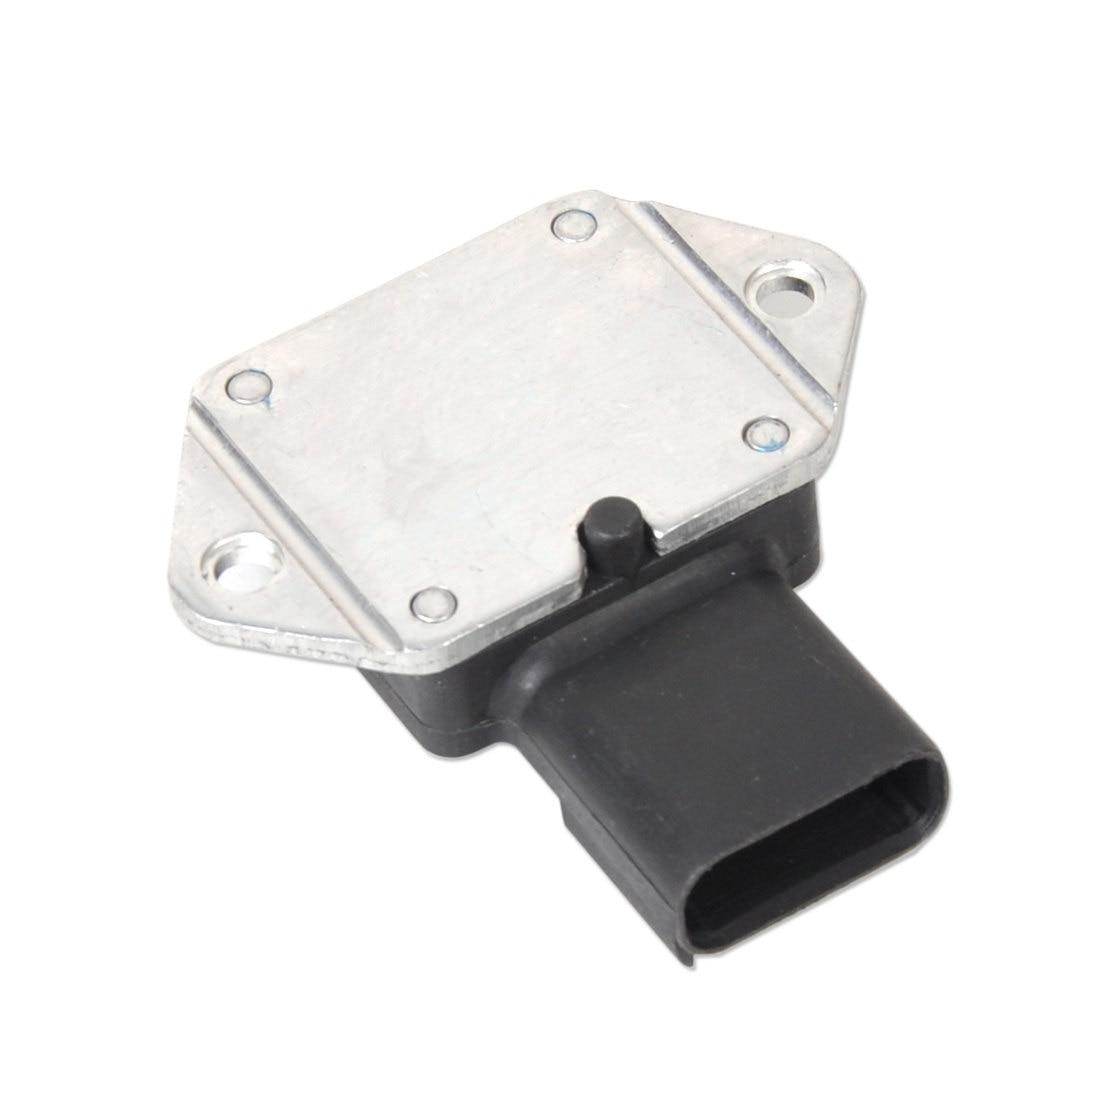 medium resolution of dwcx car radiator cooling fan relay ry330t 4707286af for jeep grand cherokee chrysler voyager dodge caravan